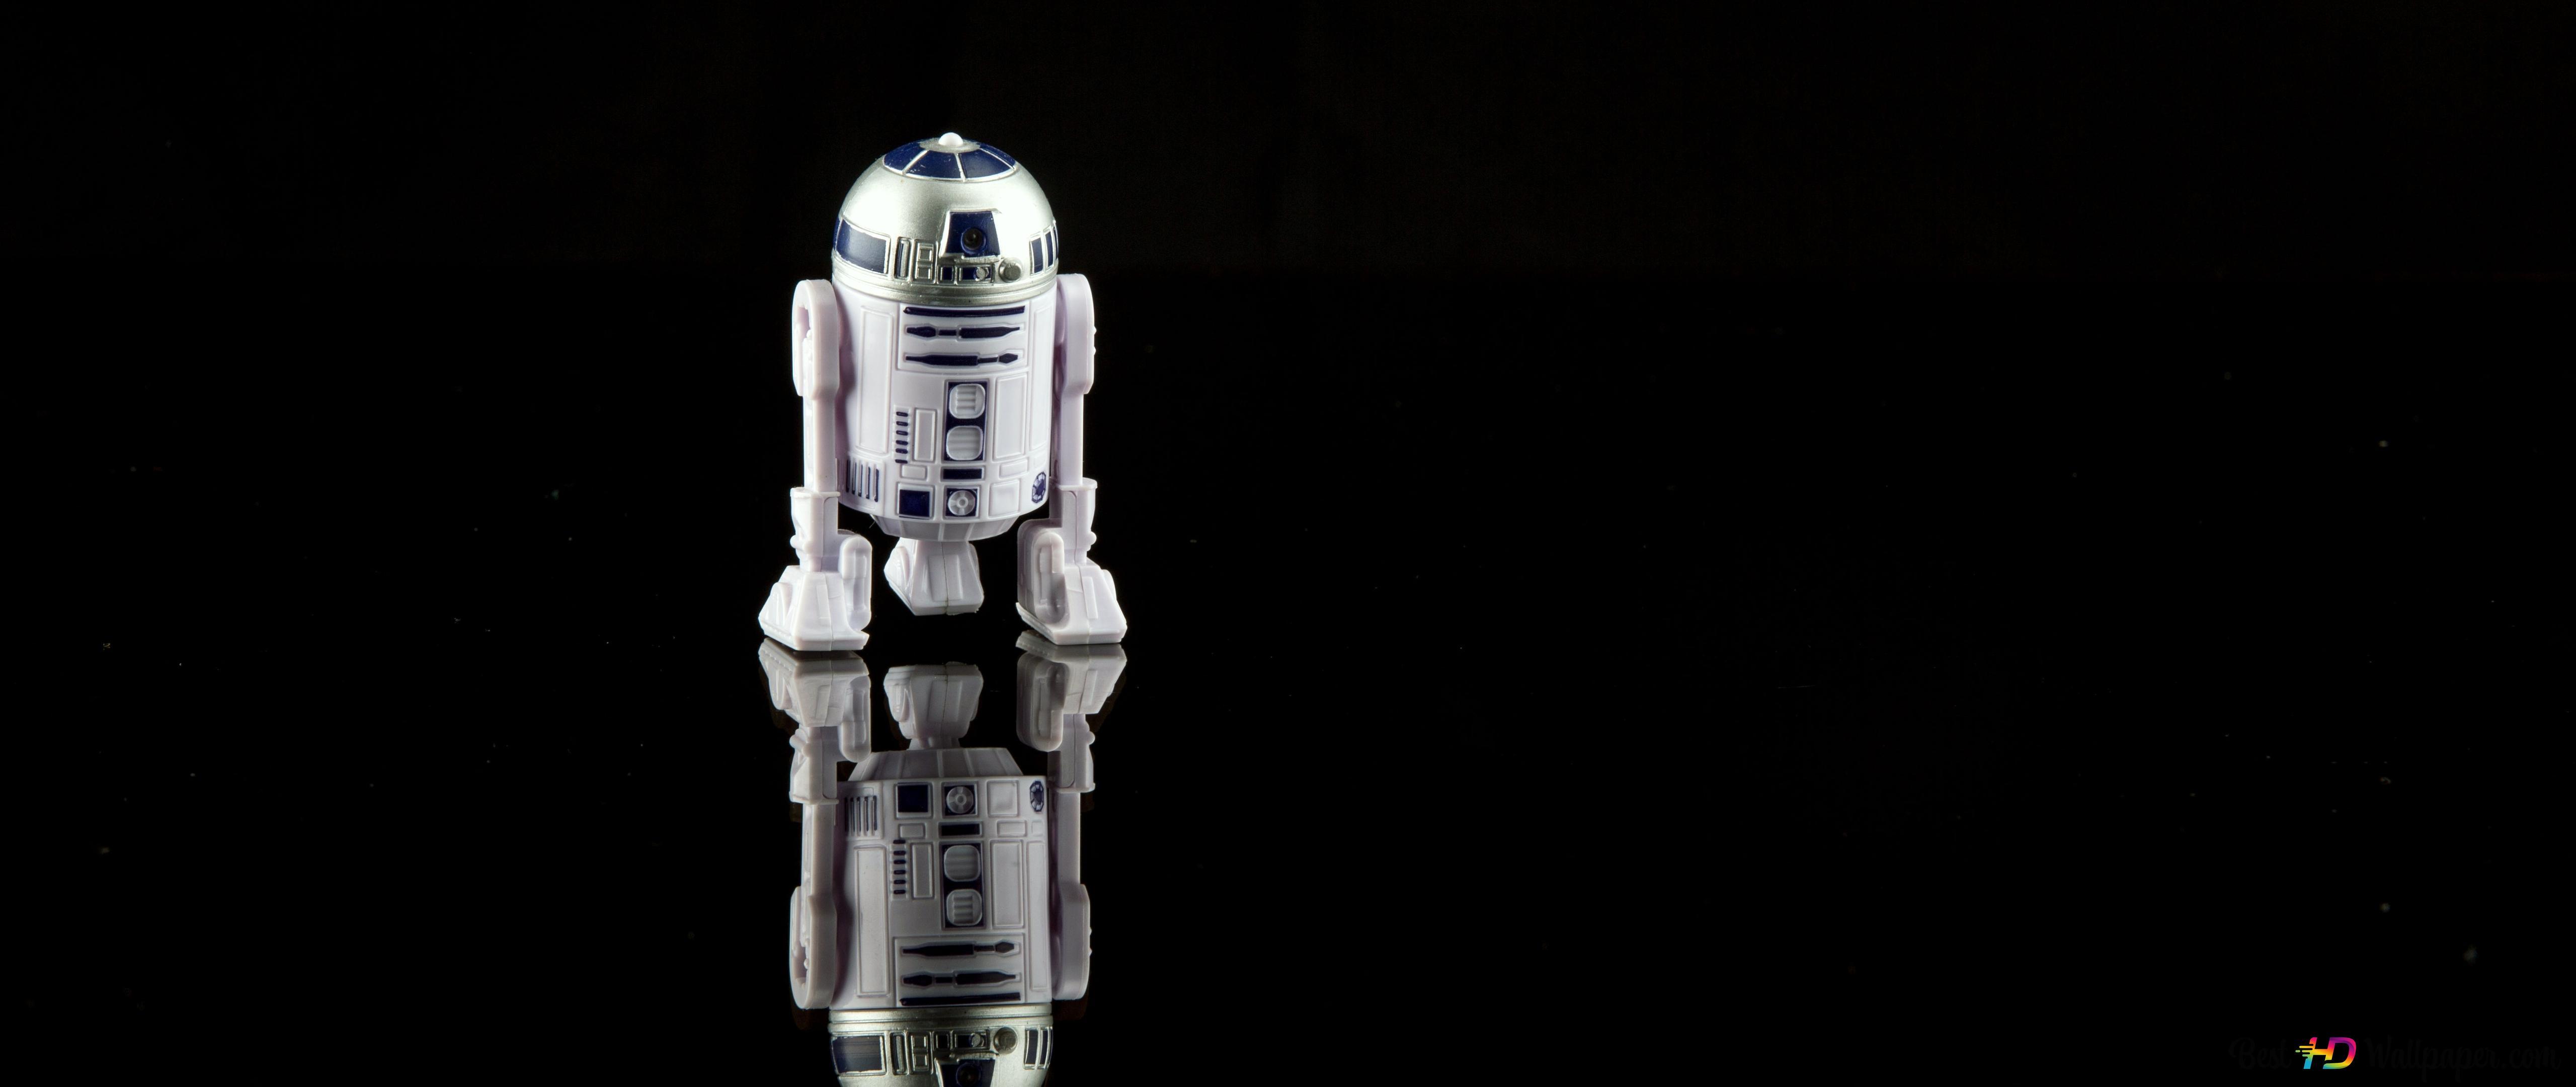 Star Wars Toy Hd Wallpaper Download